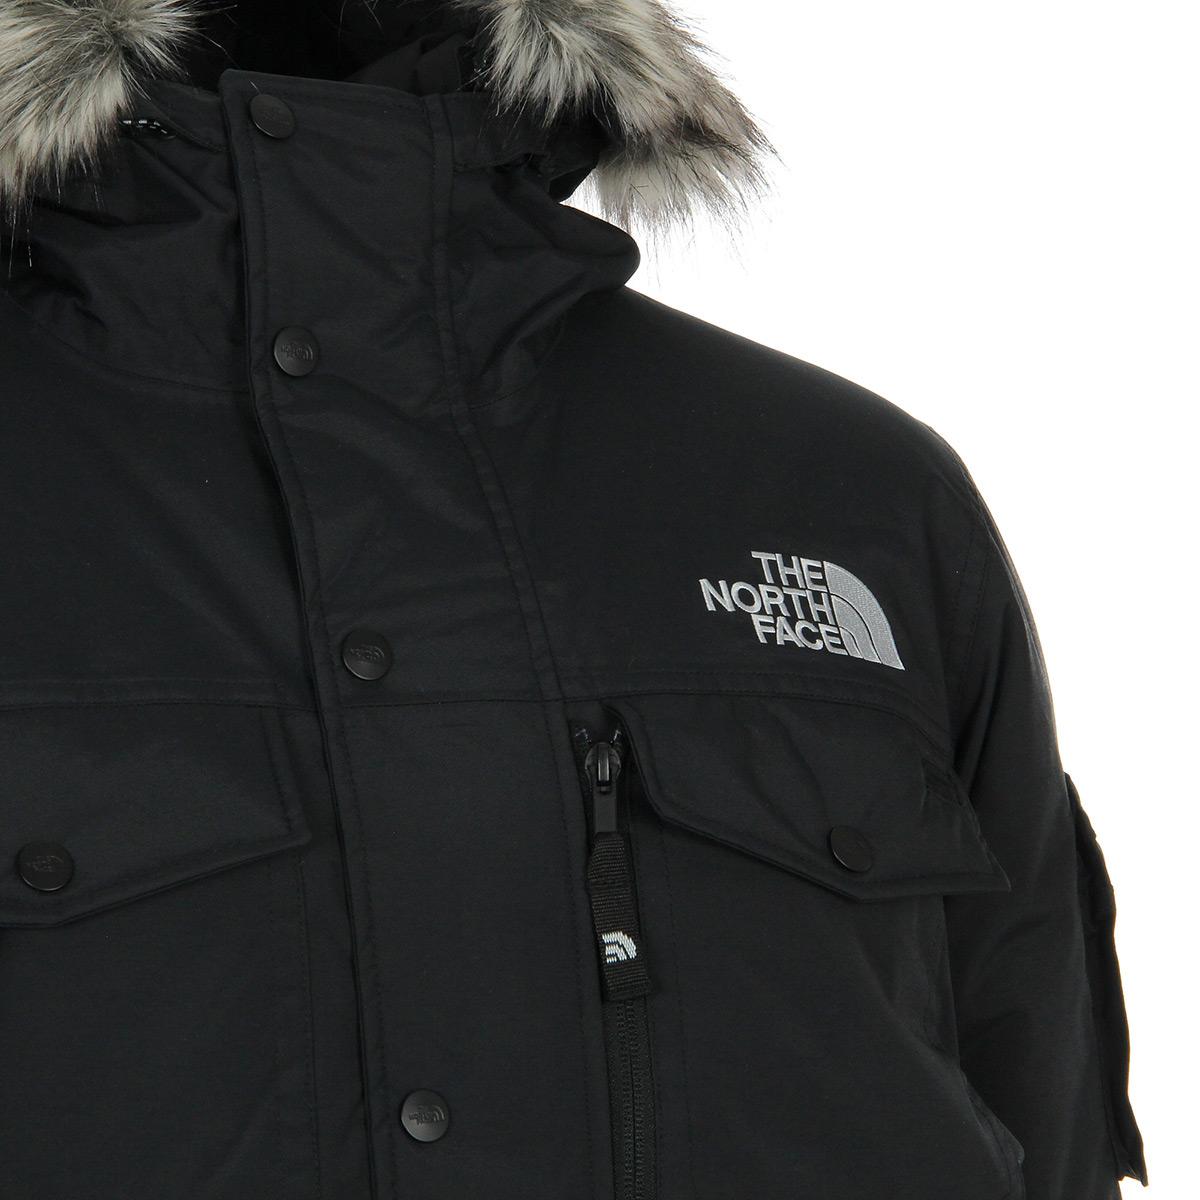 Payer Gotham The Jacket Homme Avec Face T0a8q4c4v Le Blousons North wgqxAYEq60